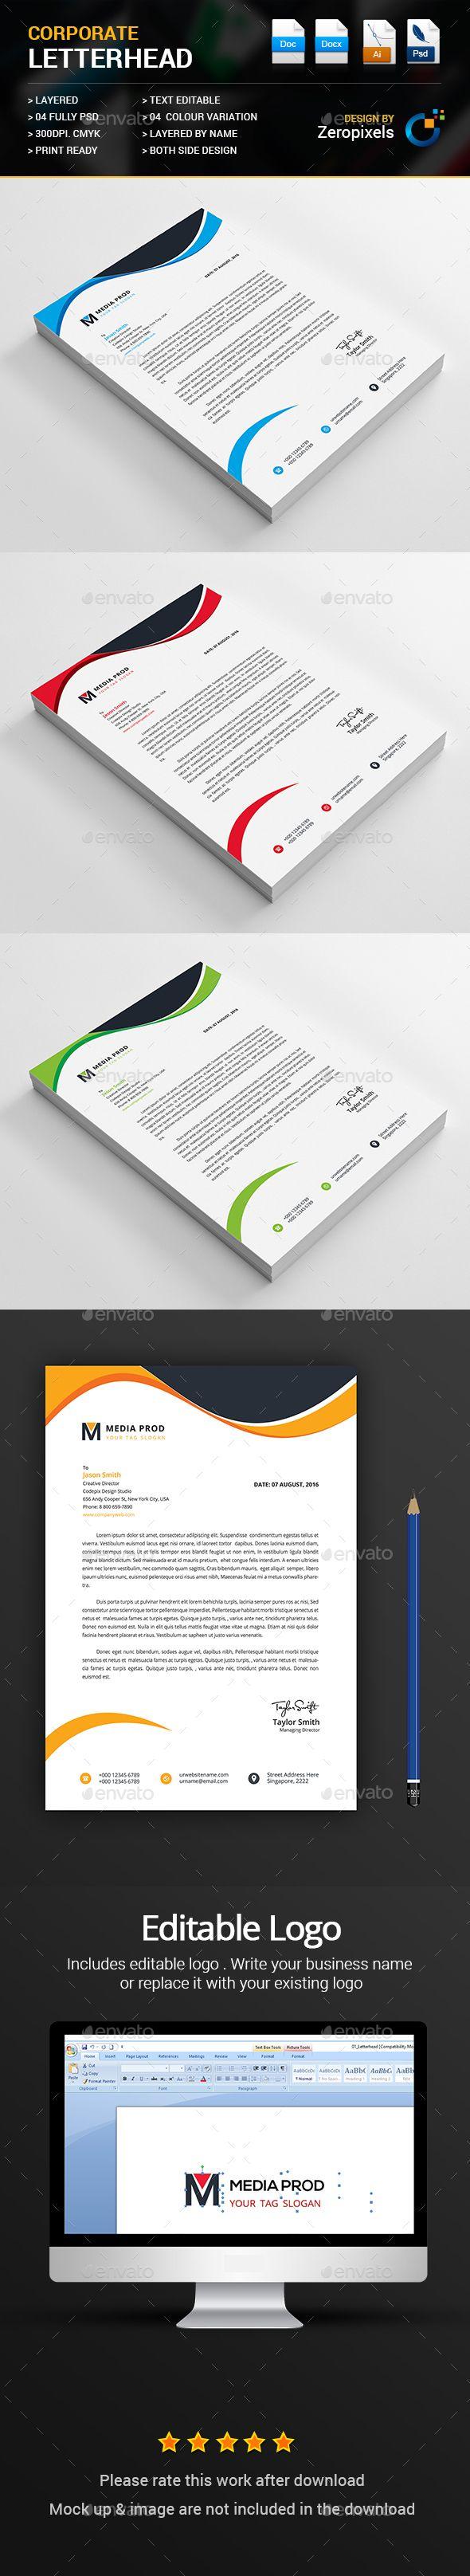 Letterhead — PSD Template #landscape #company • Download ➝ https://graphicriver.net/item/letterhead/18190410?ref=pxcr